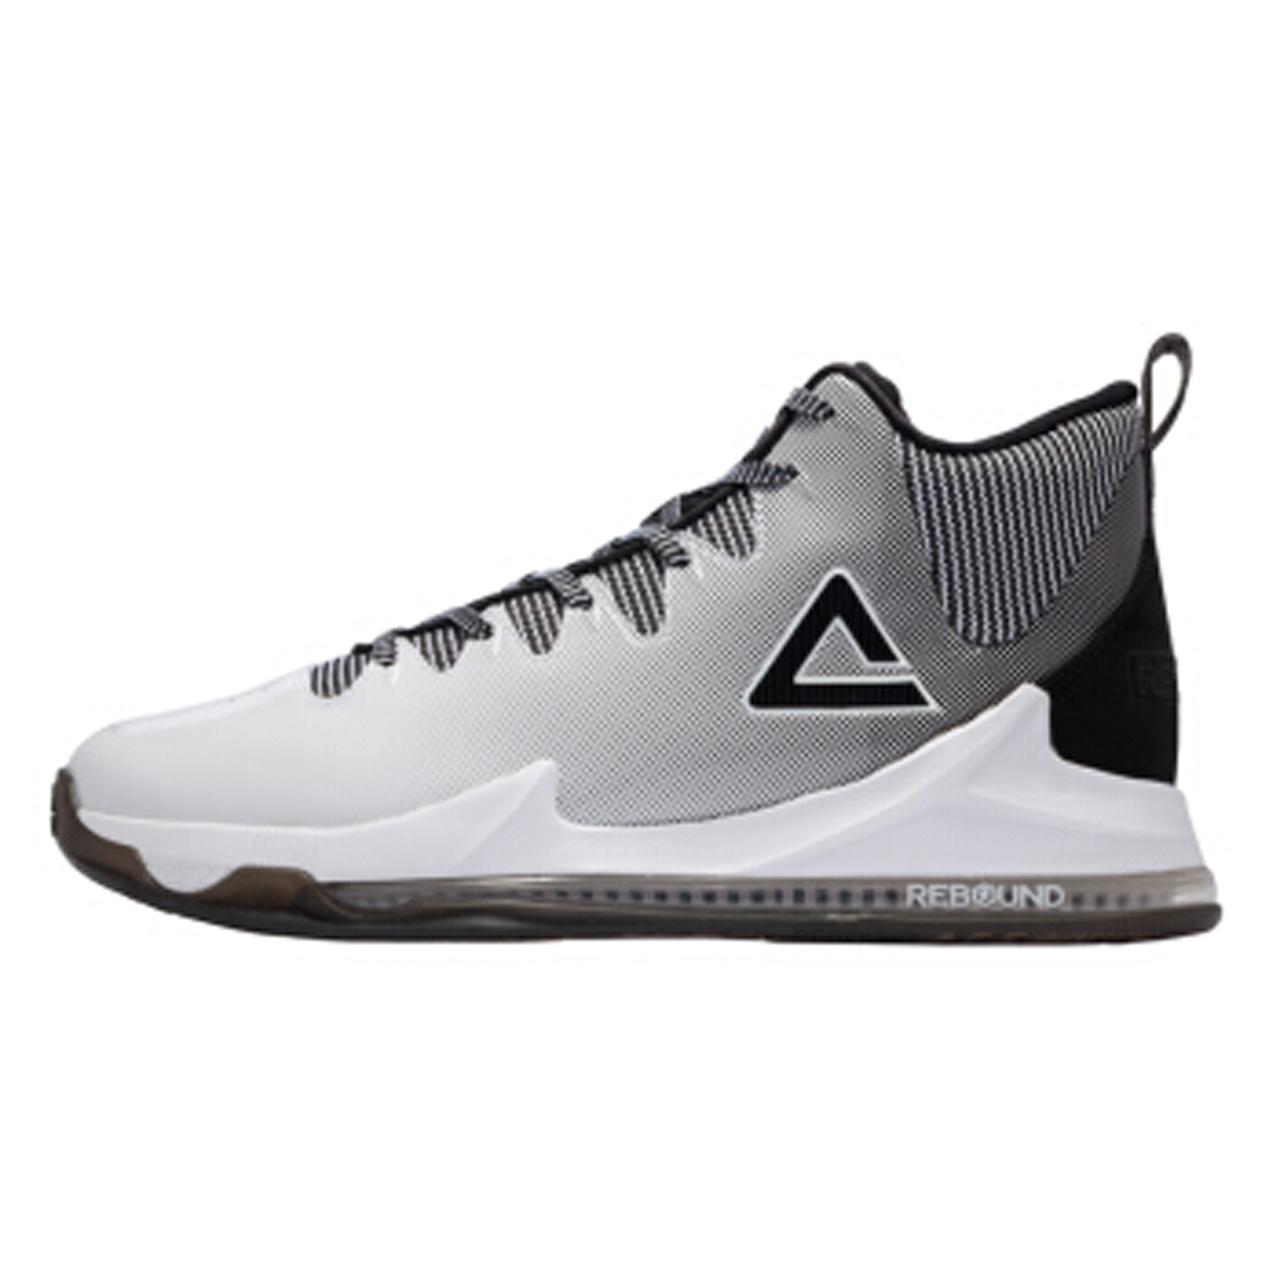 قیمت کفش بسکتبال مردانه پیک مدل  E74111A